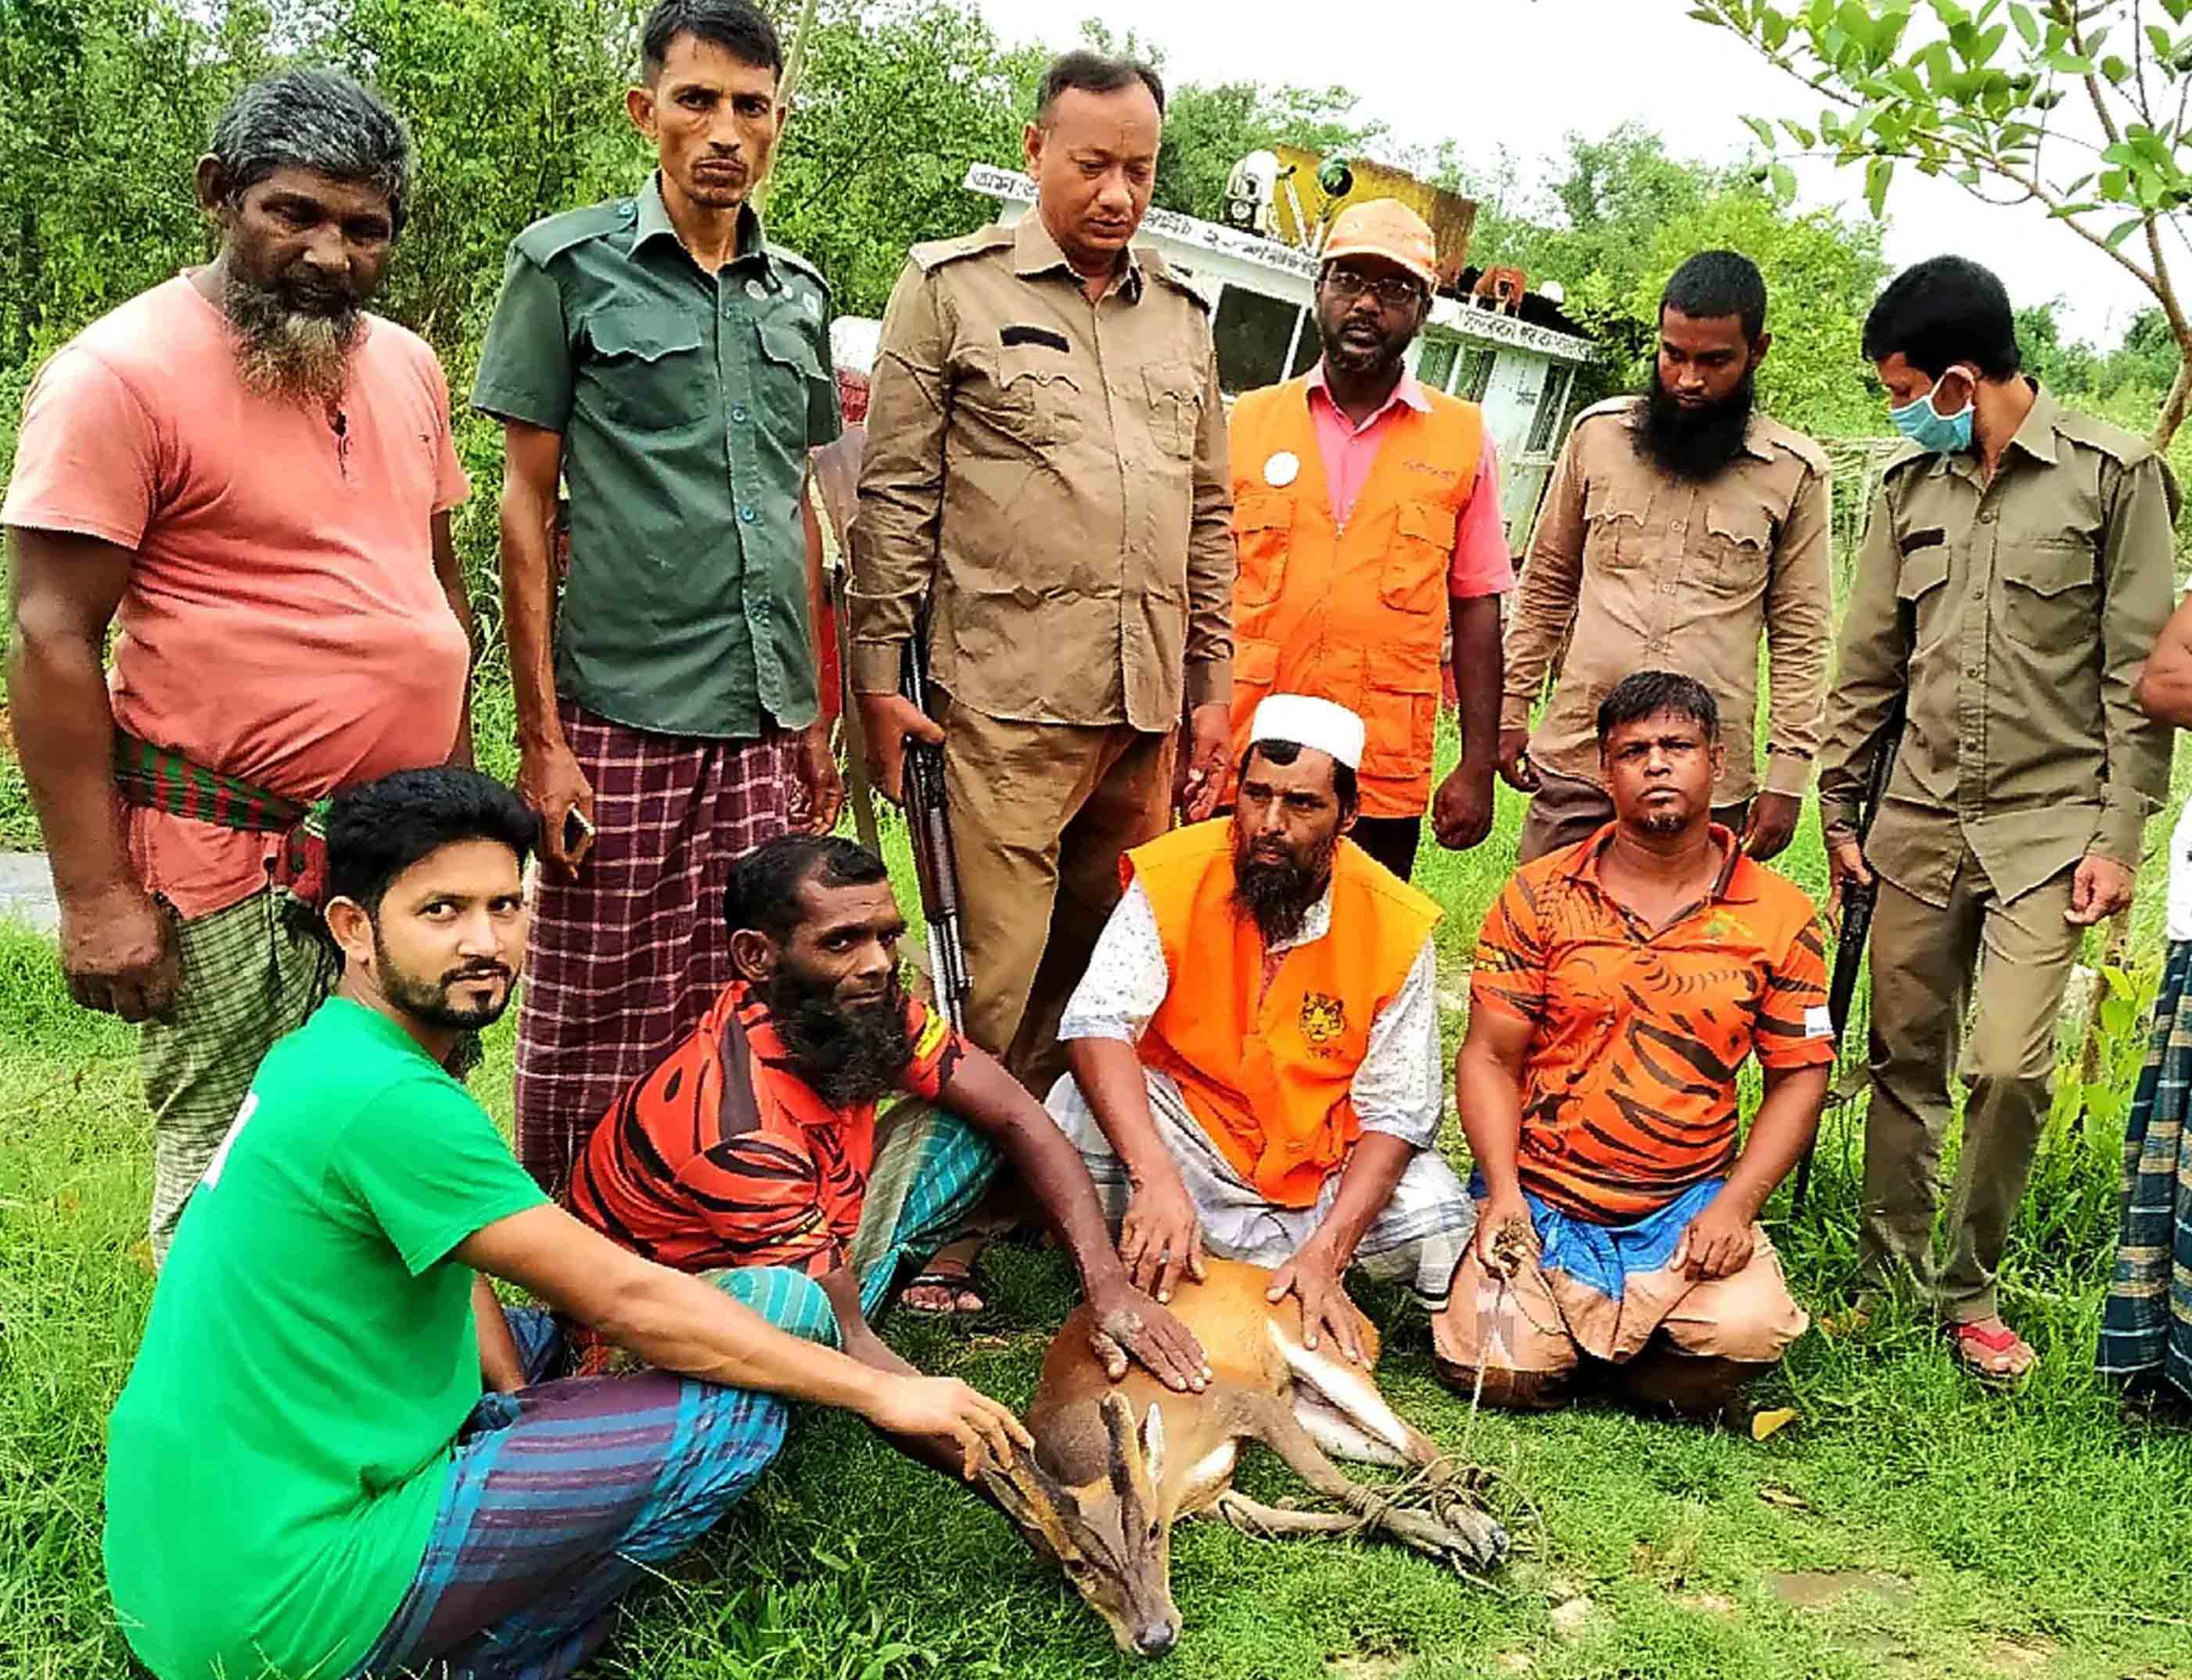 Deer rescued from village released in Sundarbans